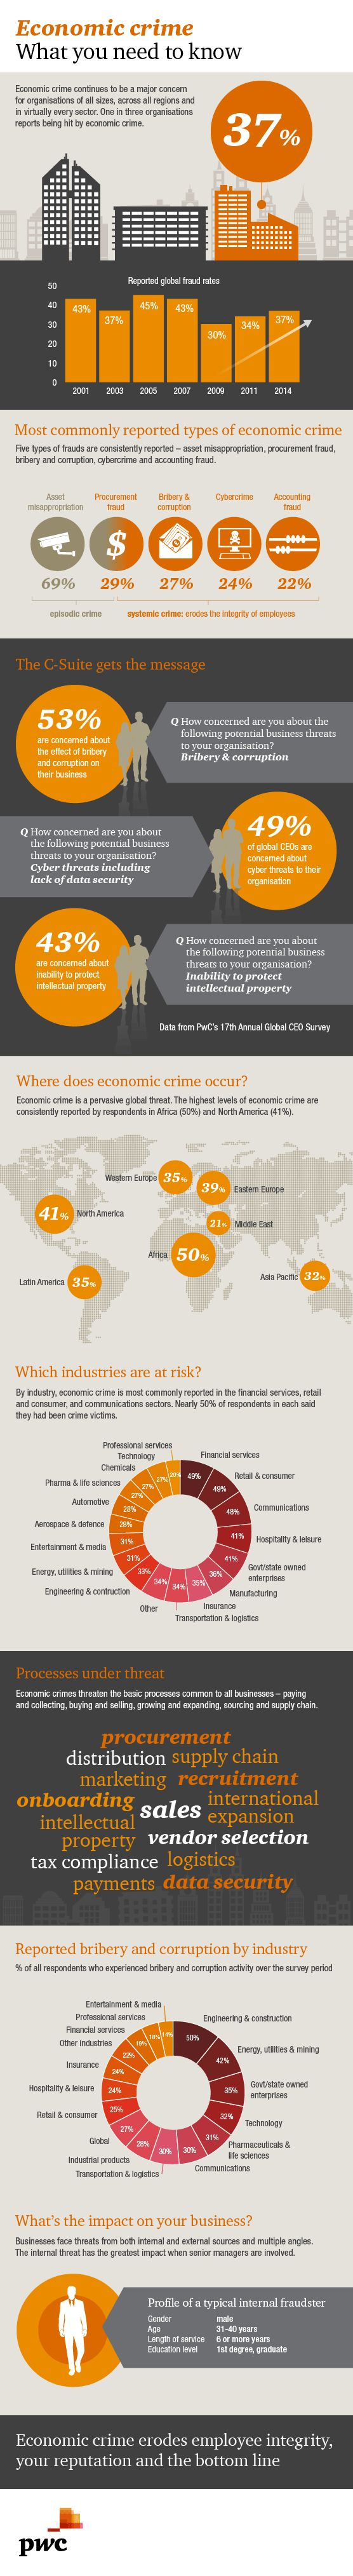 Global economic crime survey 2014: Infographic: PwC